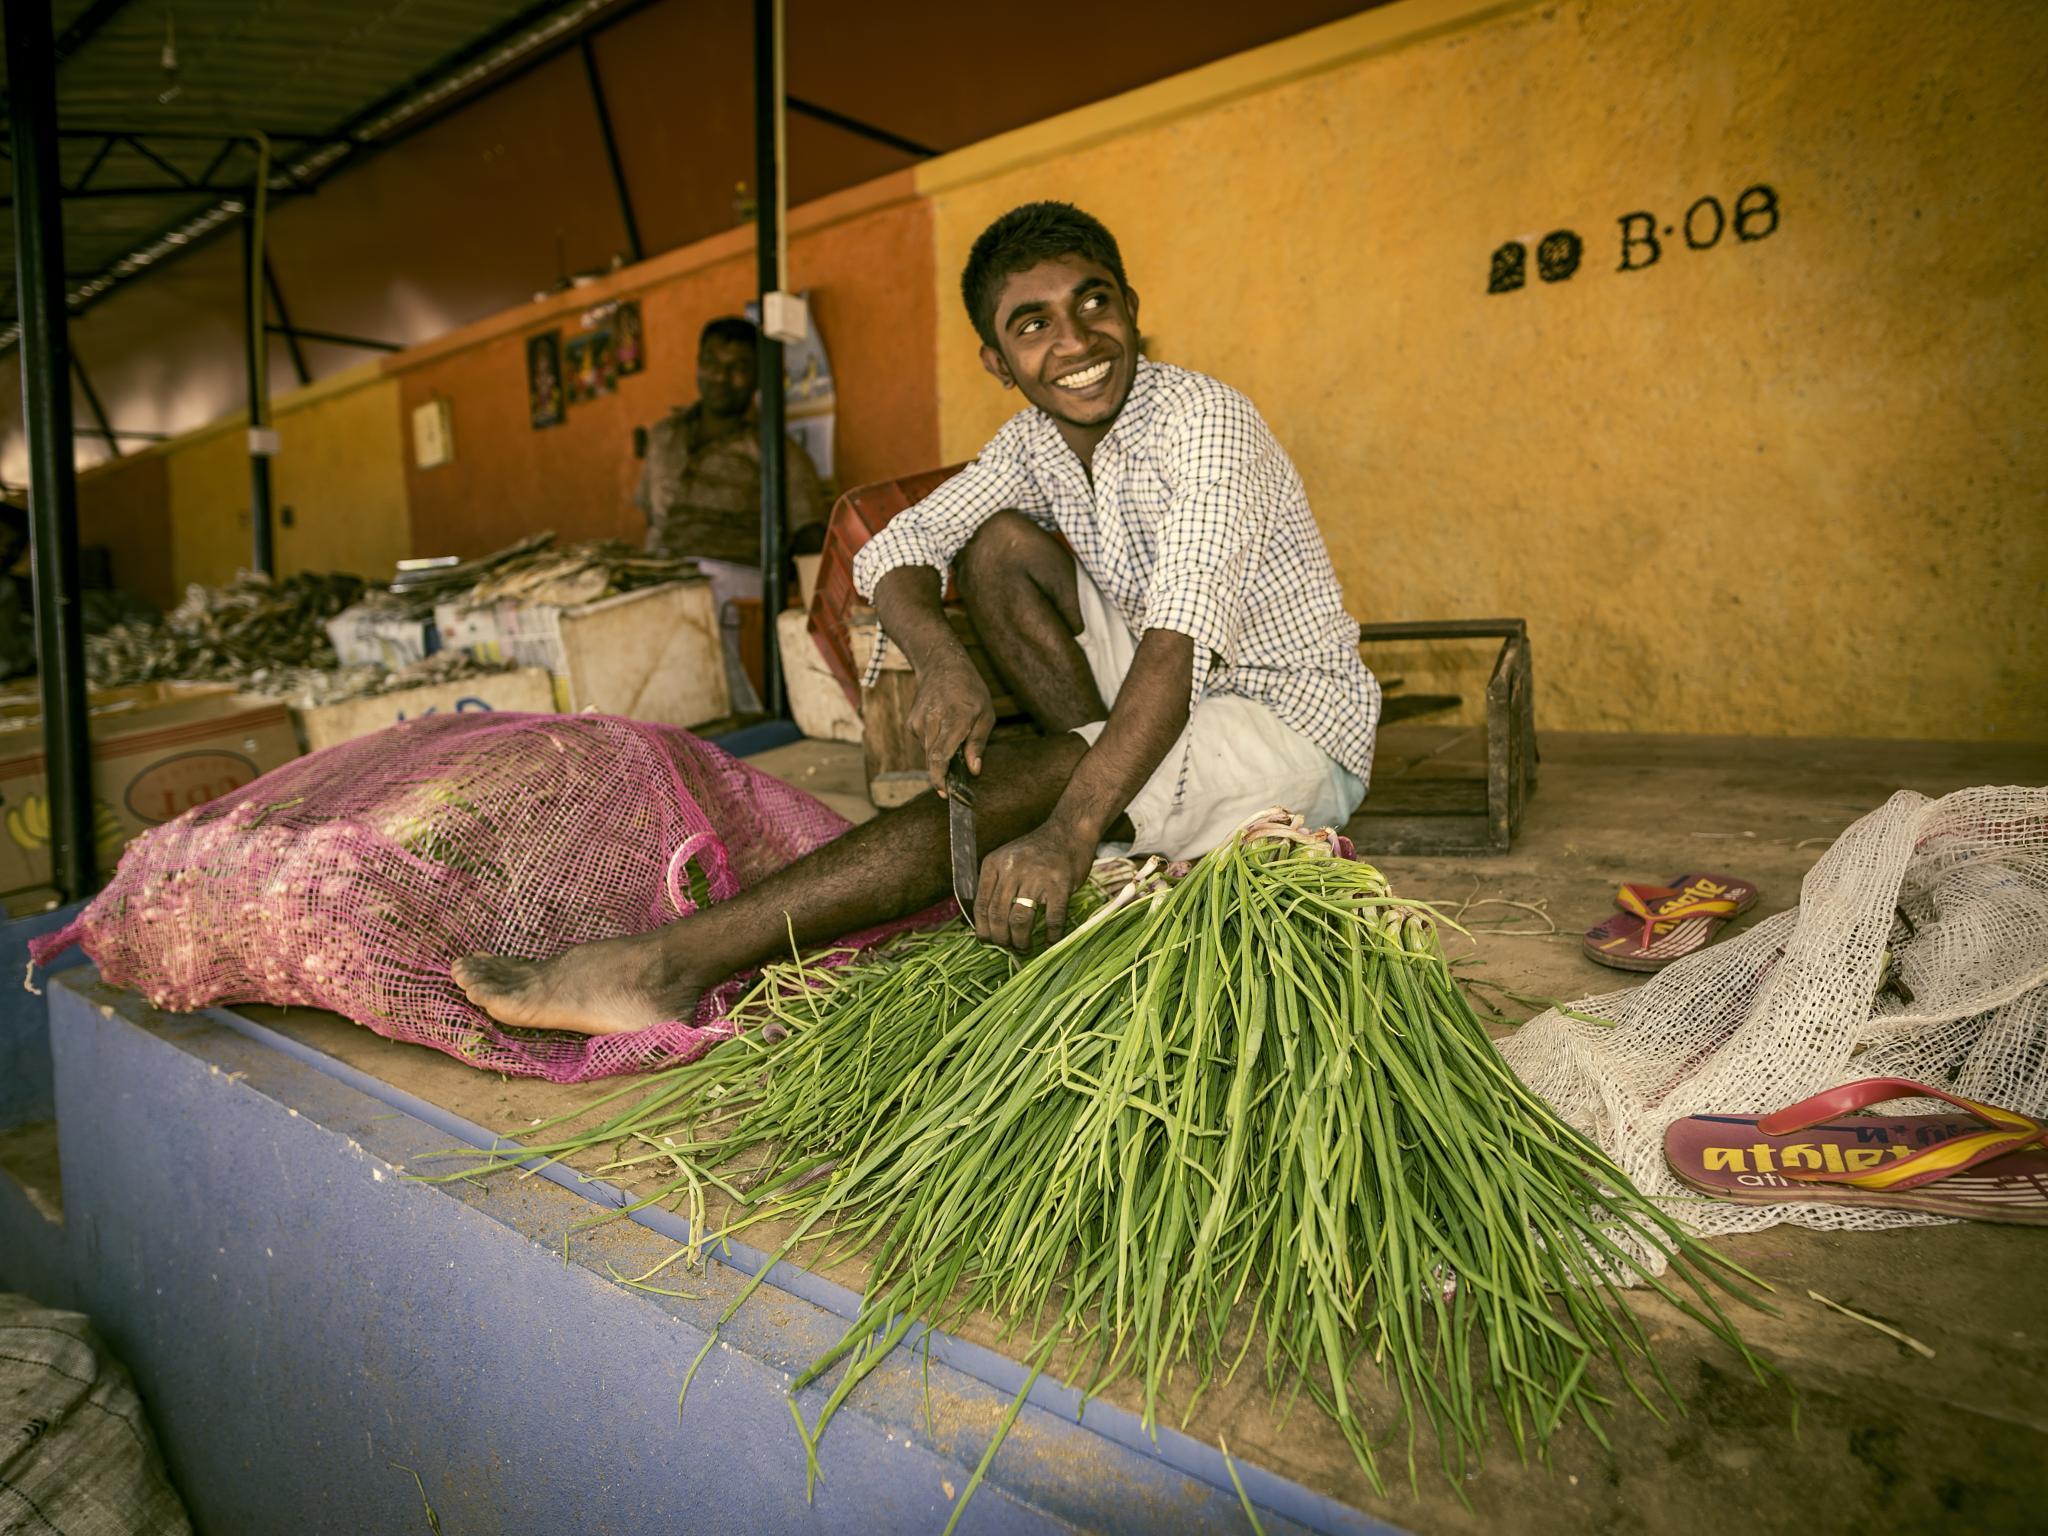 Anuradhapura market, Sri Lanka by Rafal Krzysiak